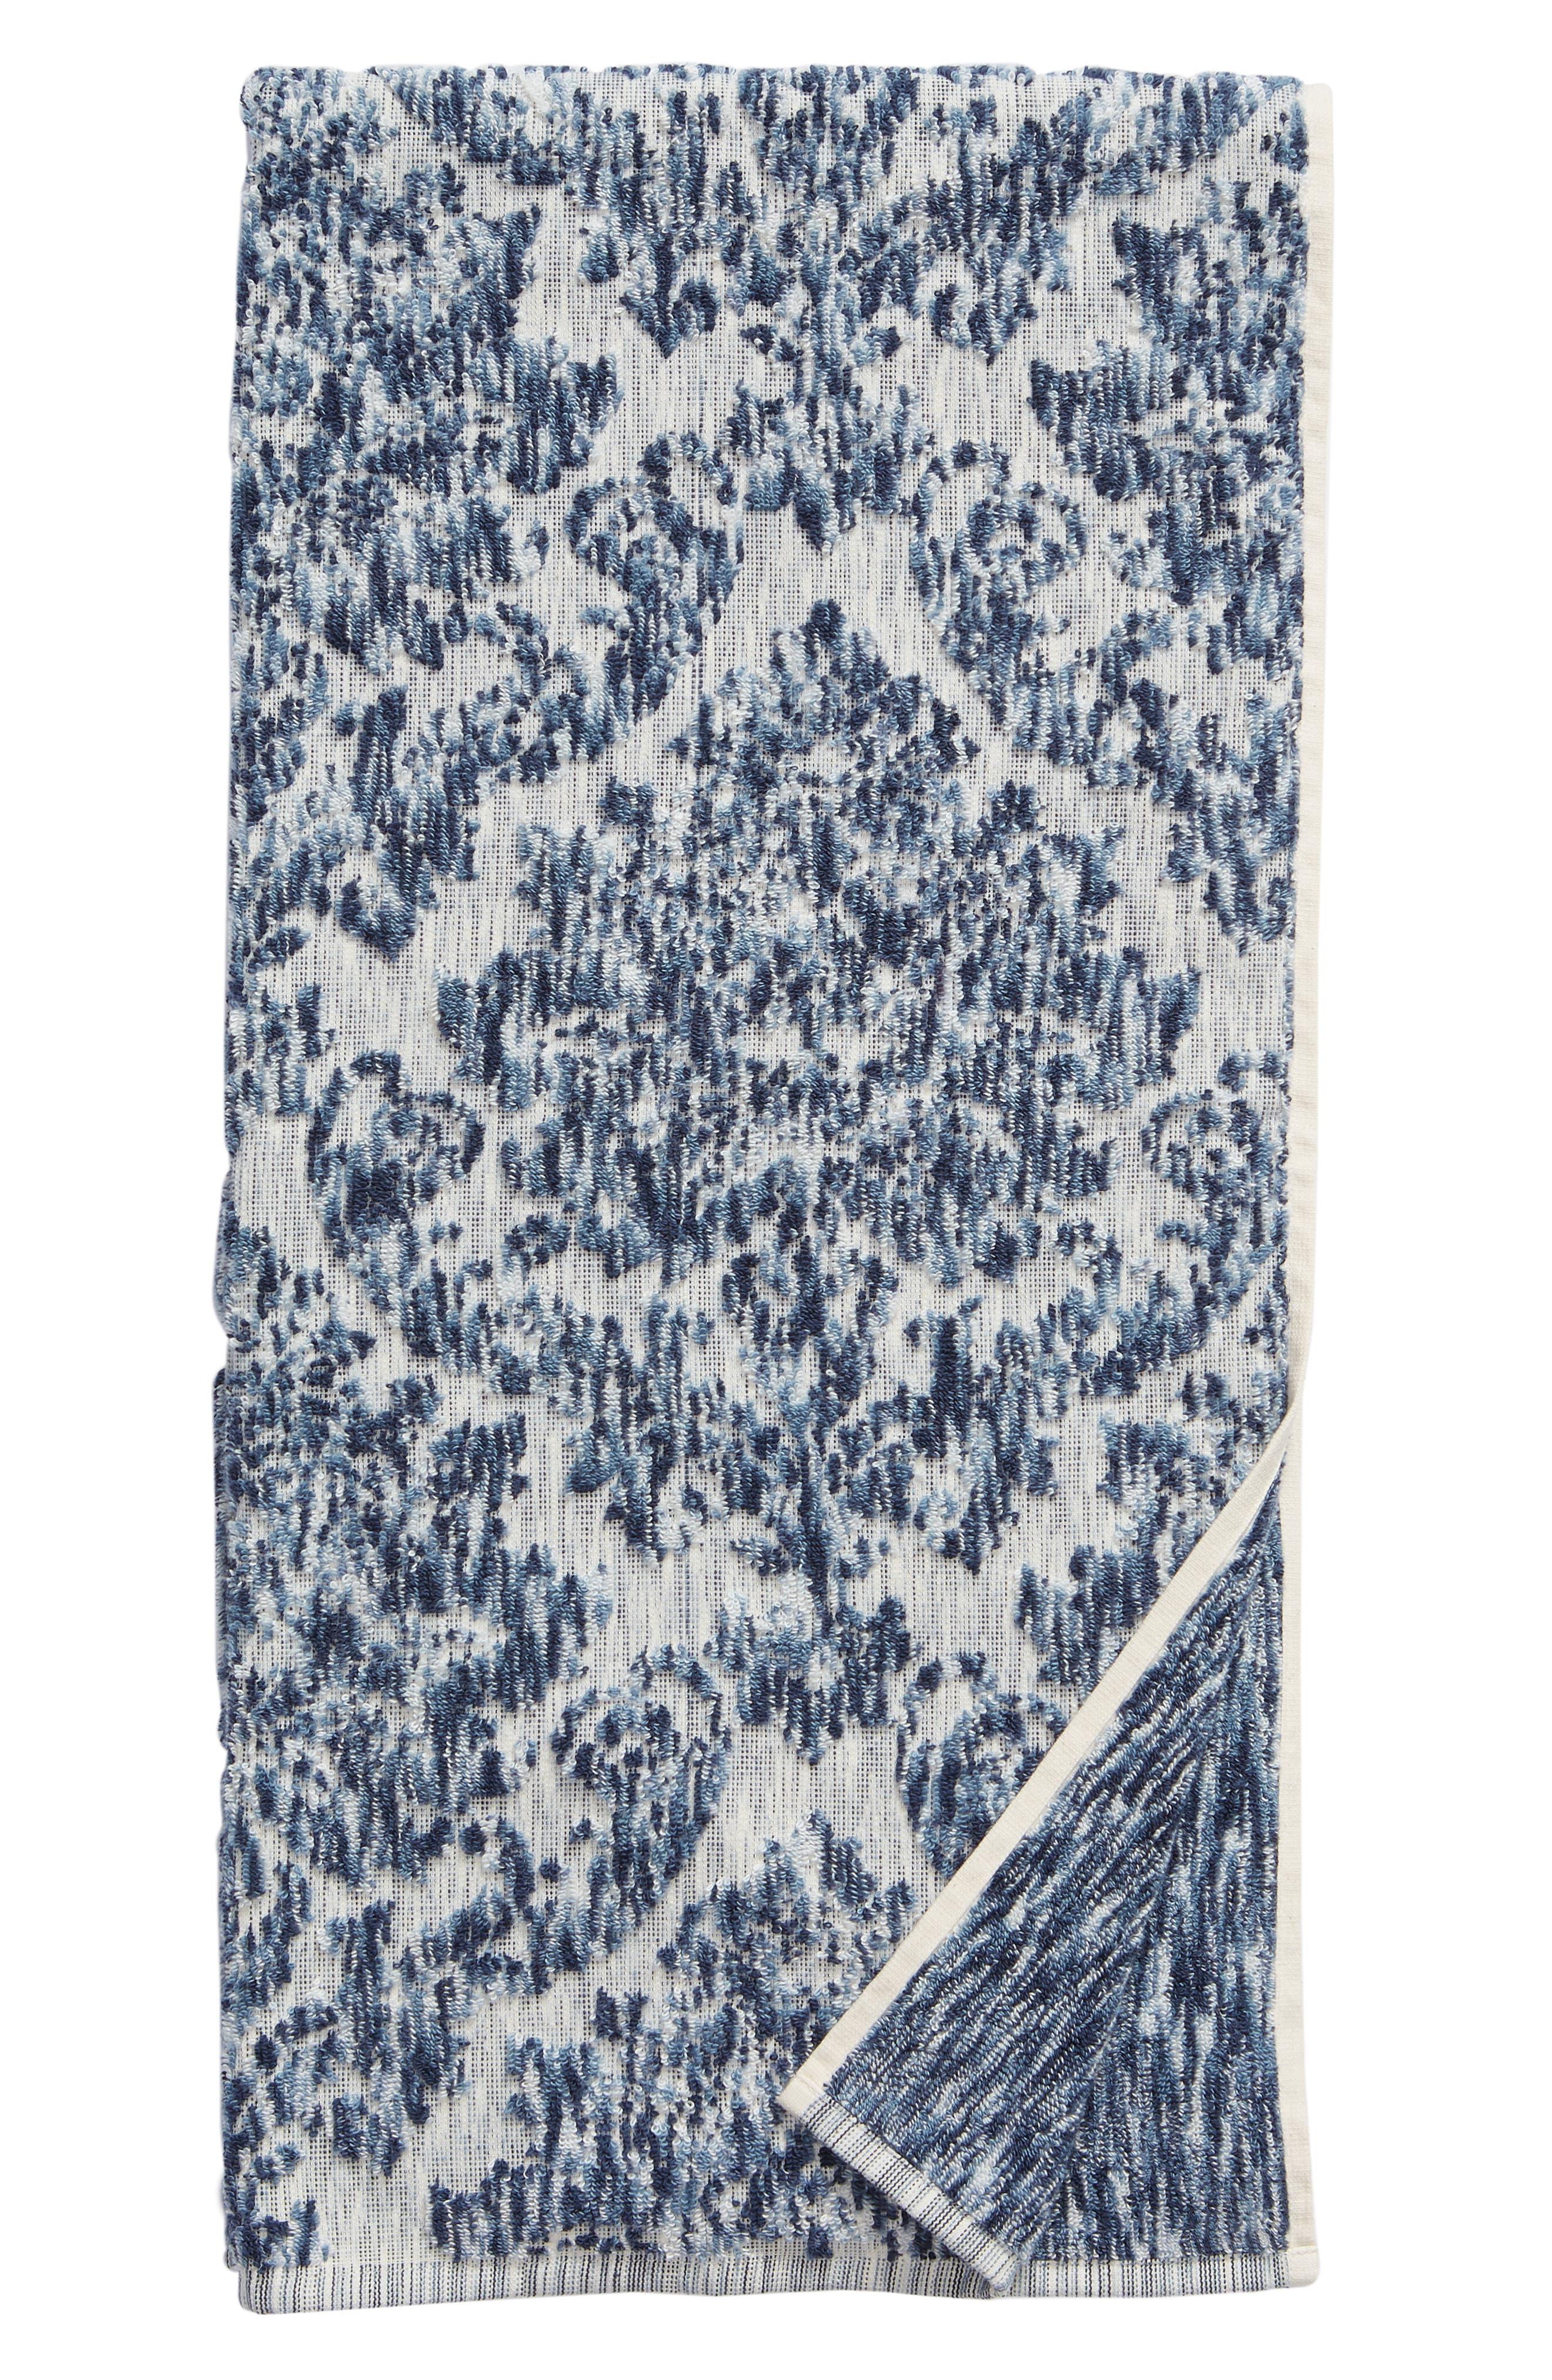 NORDSTROM AT HOME, Easton Bath Towel, Main thumbnail 1, color, BLUE CHAMBRAY MULTI